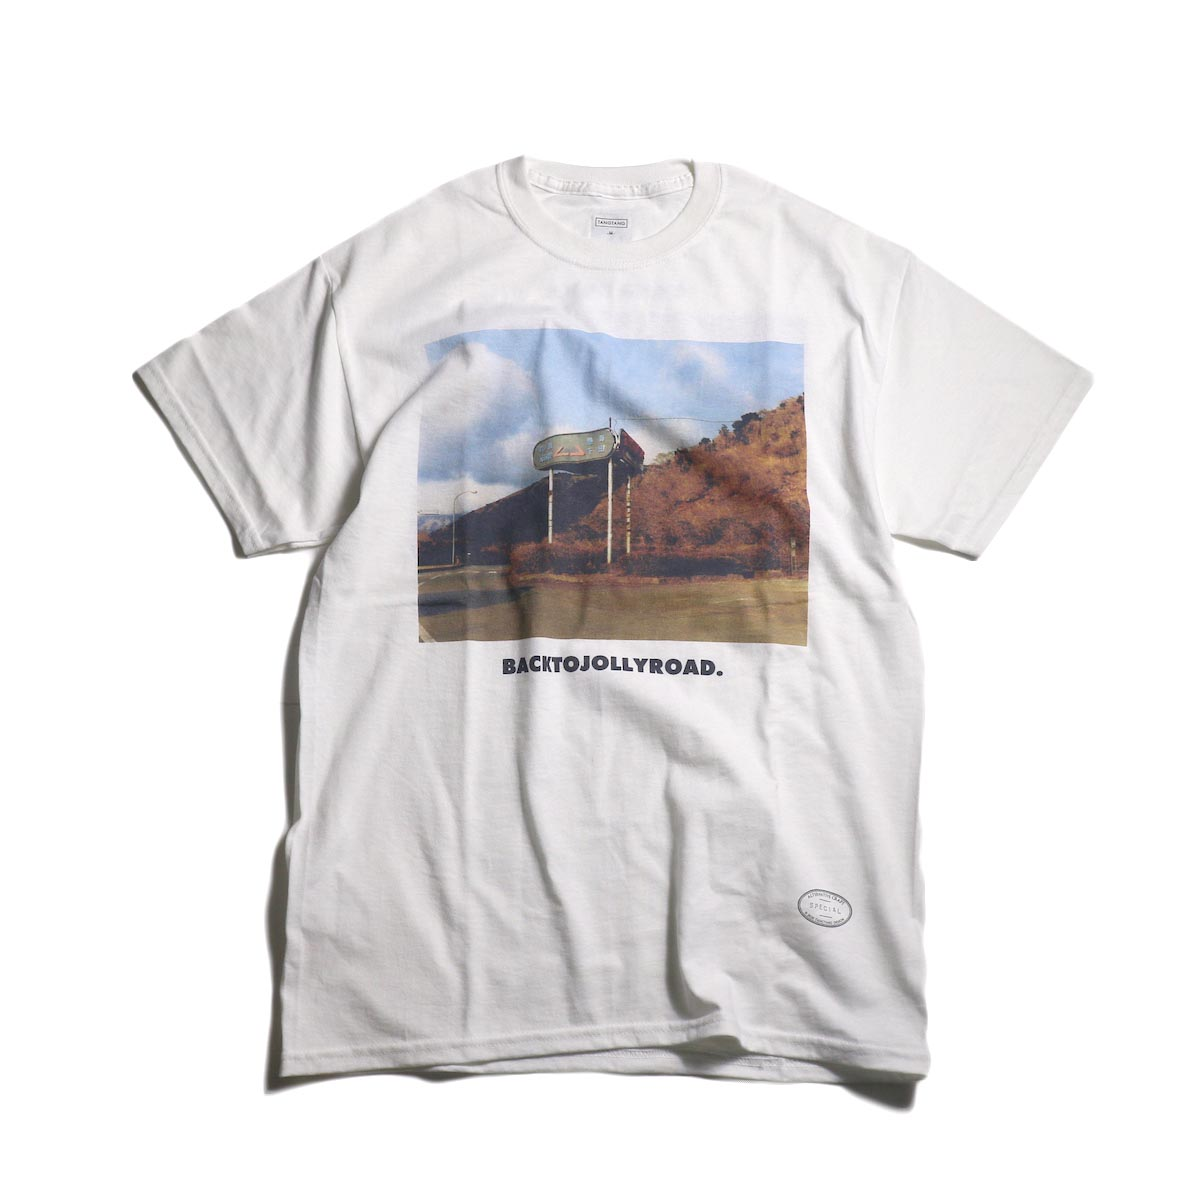 TANGTANG / GASATANA -BACKTOJOLLYROAD (White)